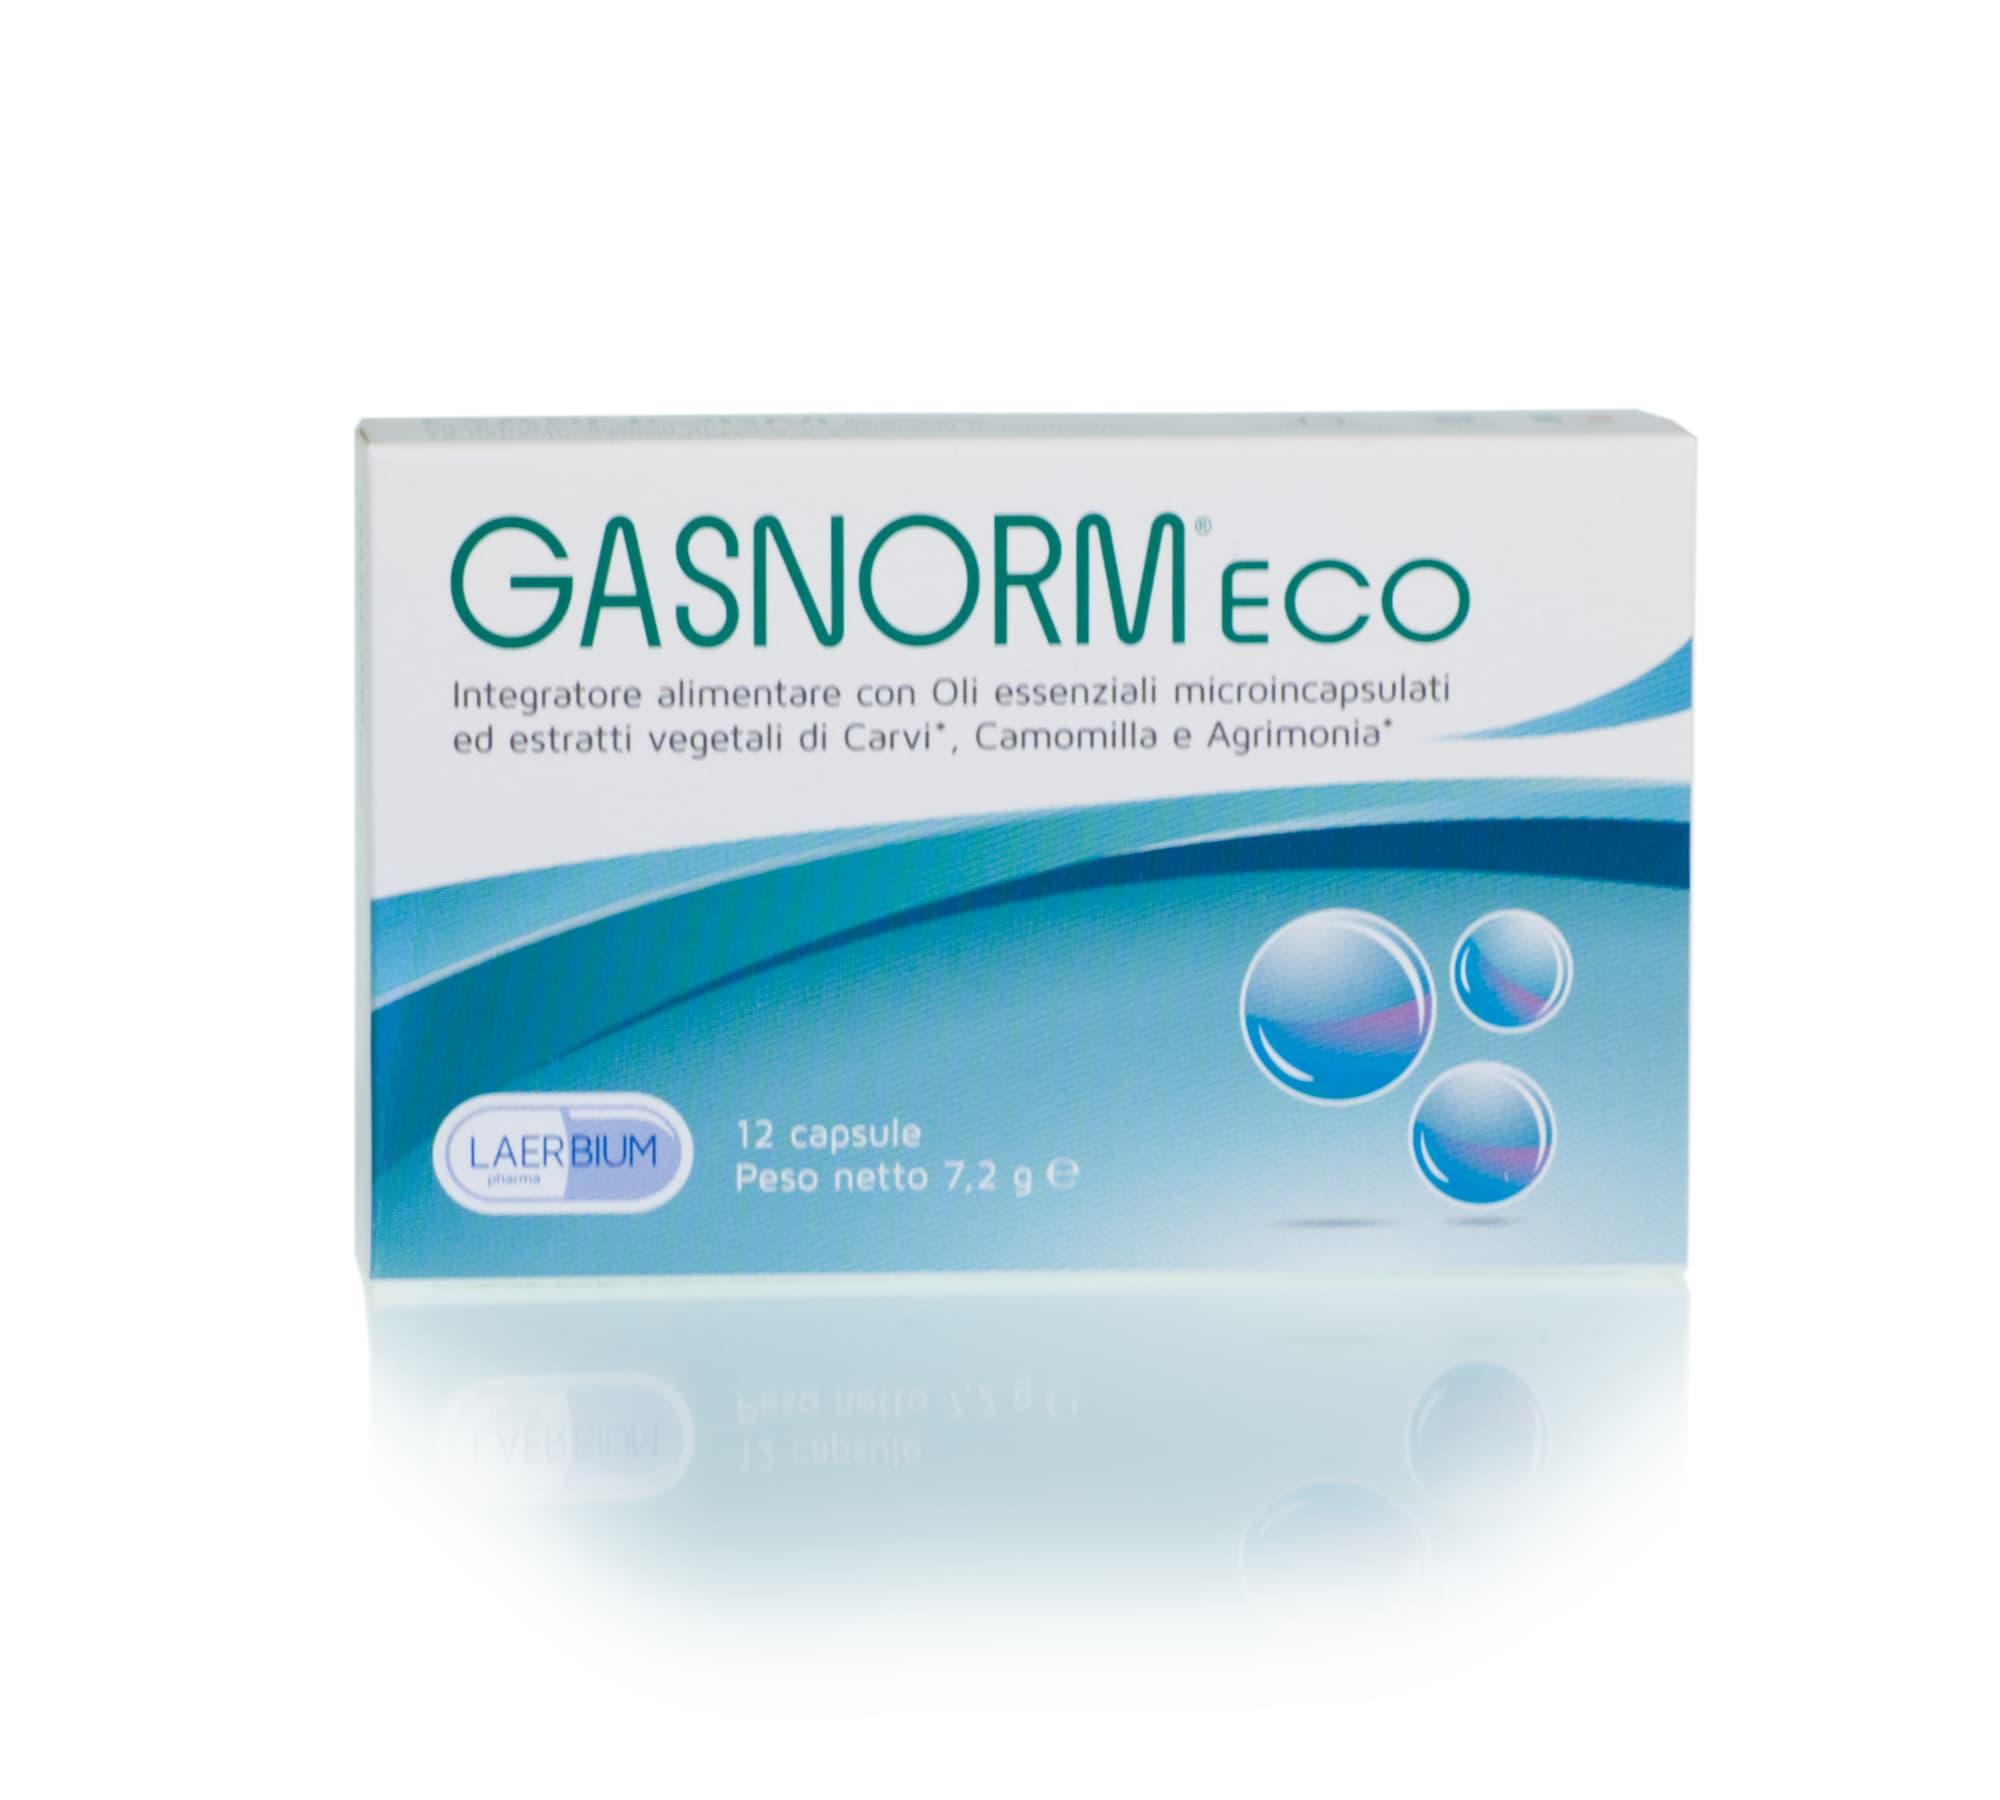 Gasnorm Eco